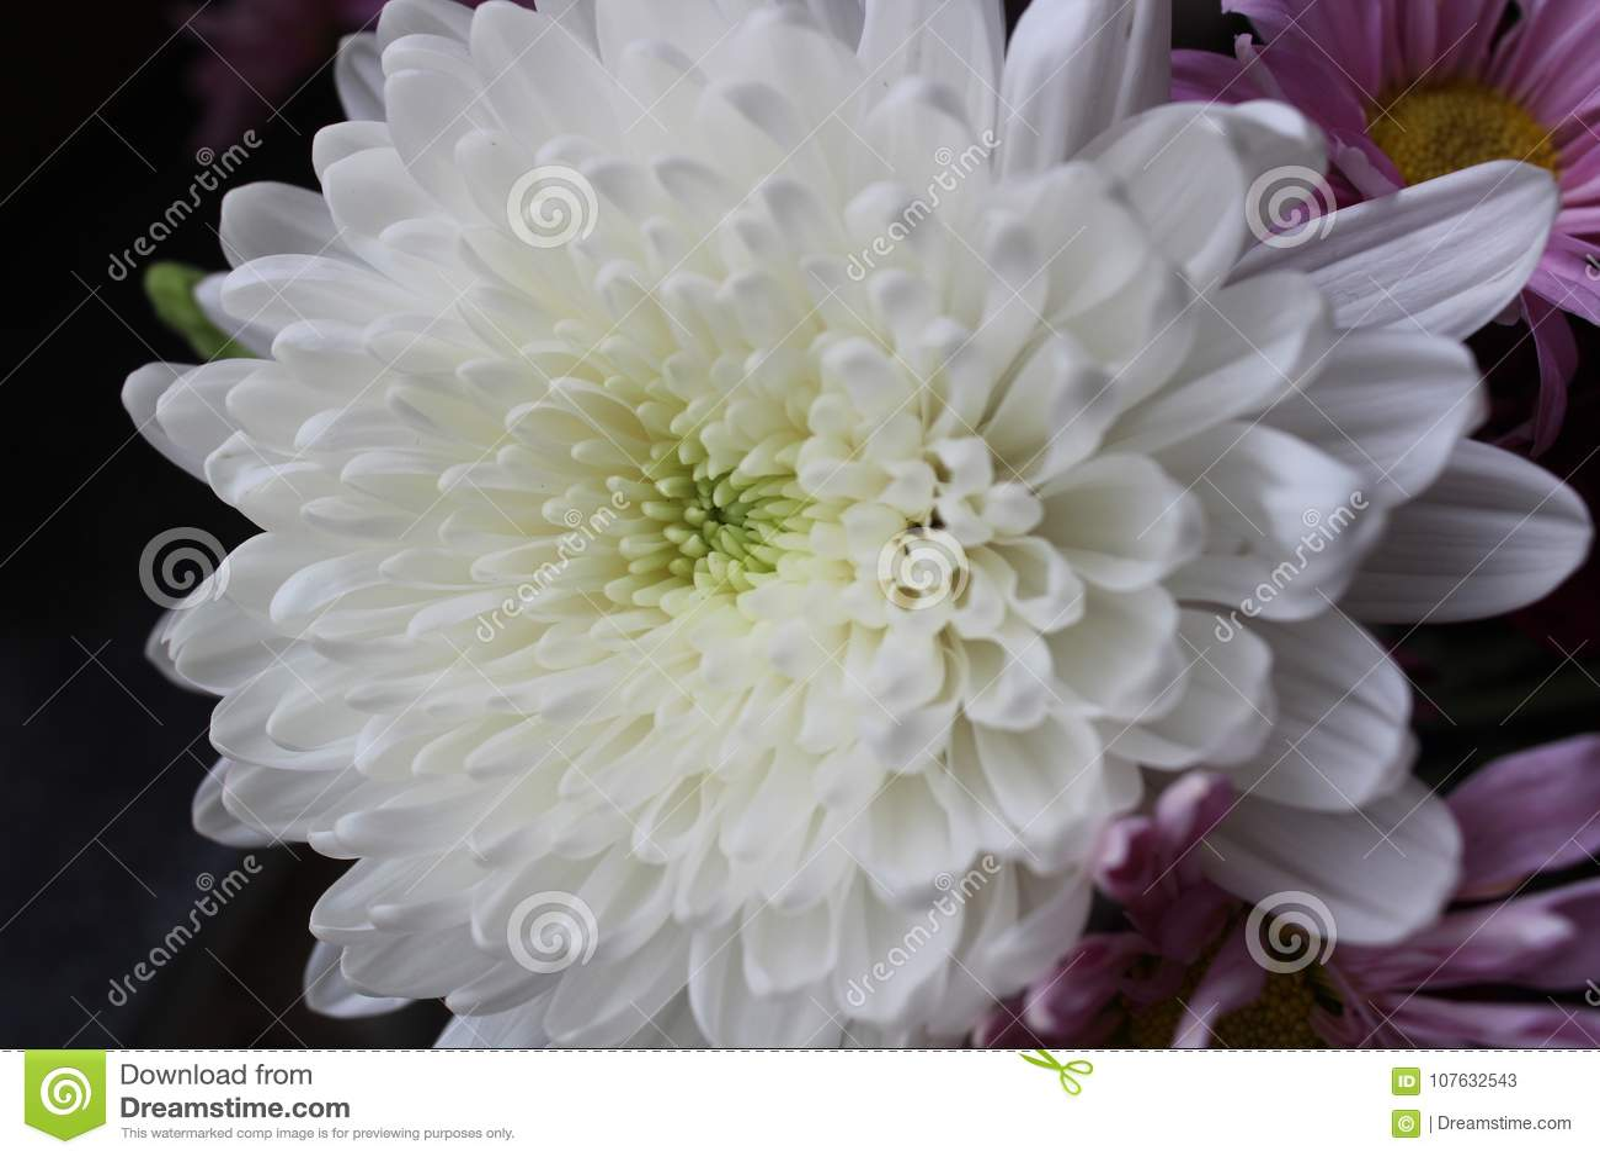 White Chrysanthemum Flower Stock Image Image Of White 107632543